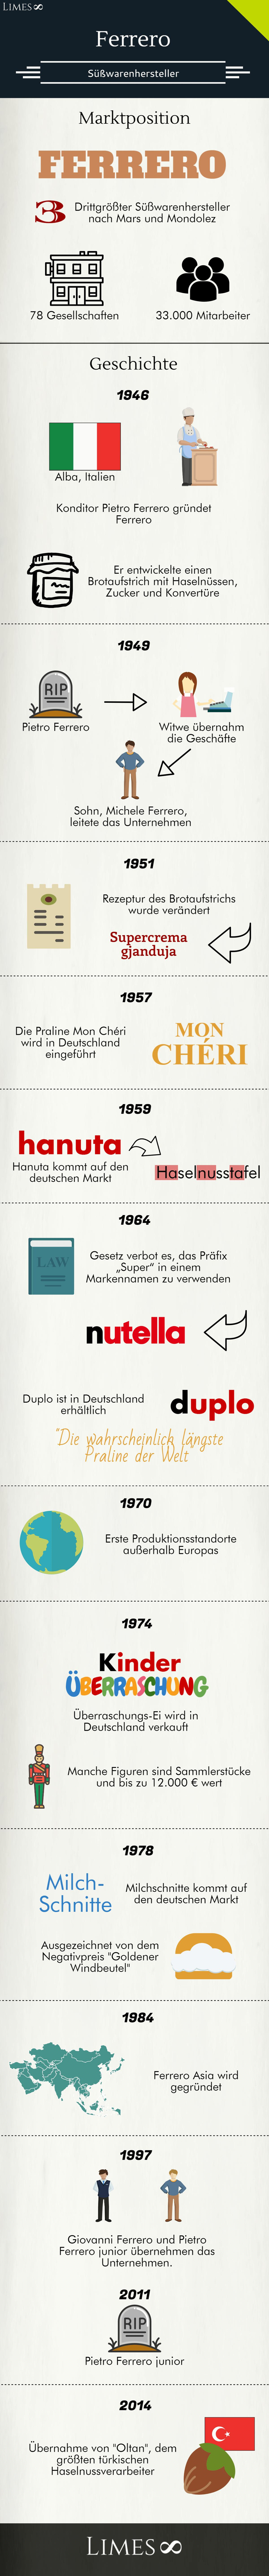 Infografik über Ferrero